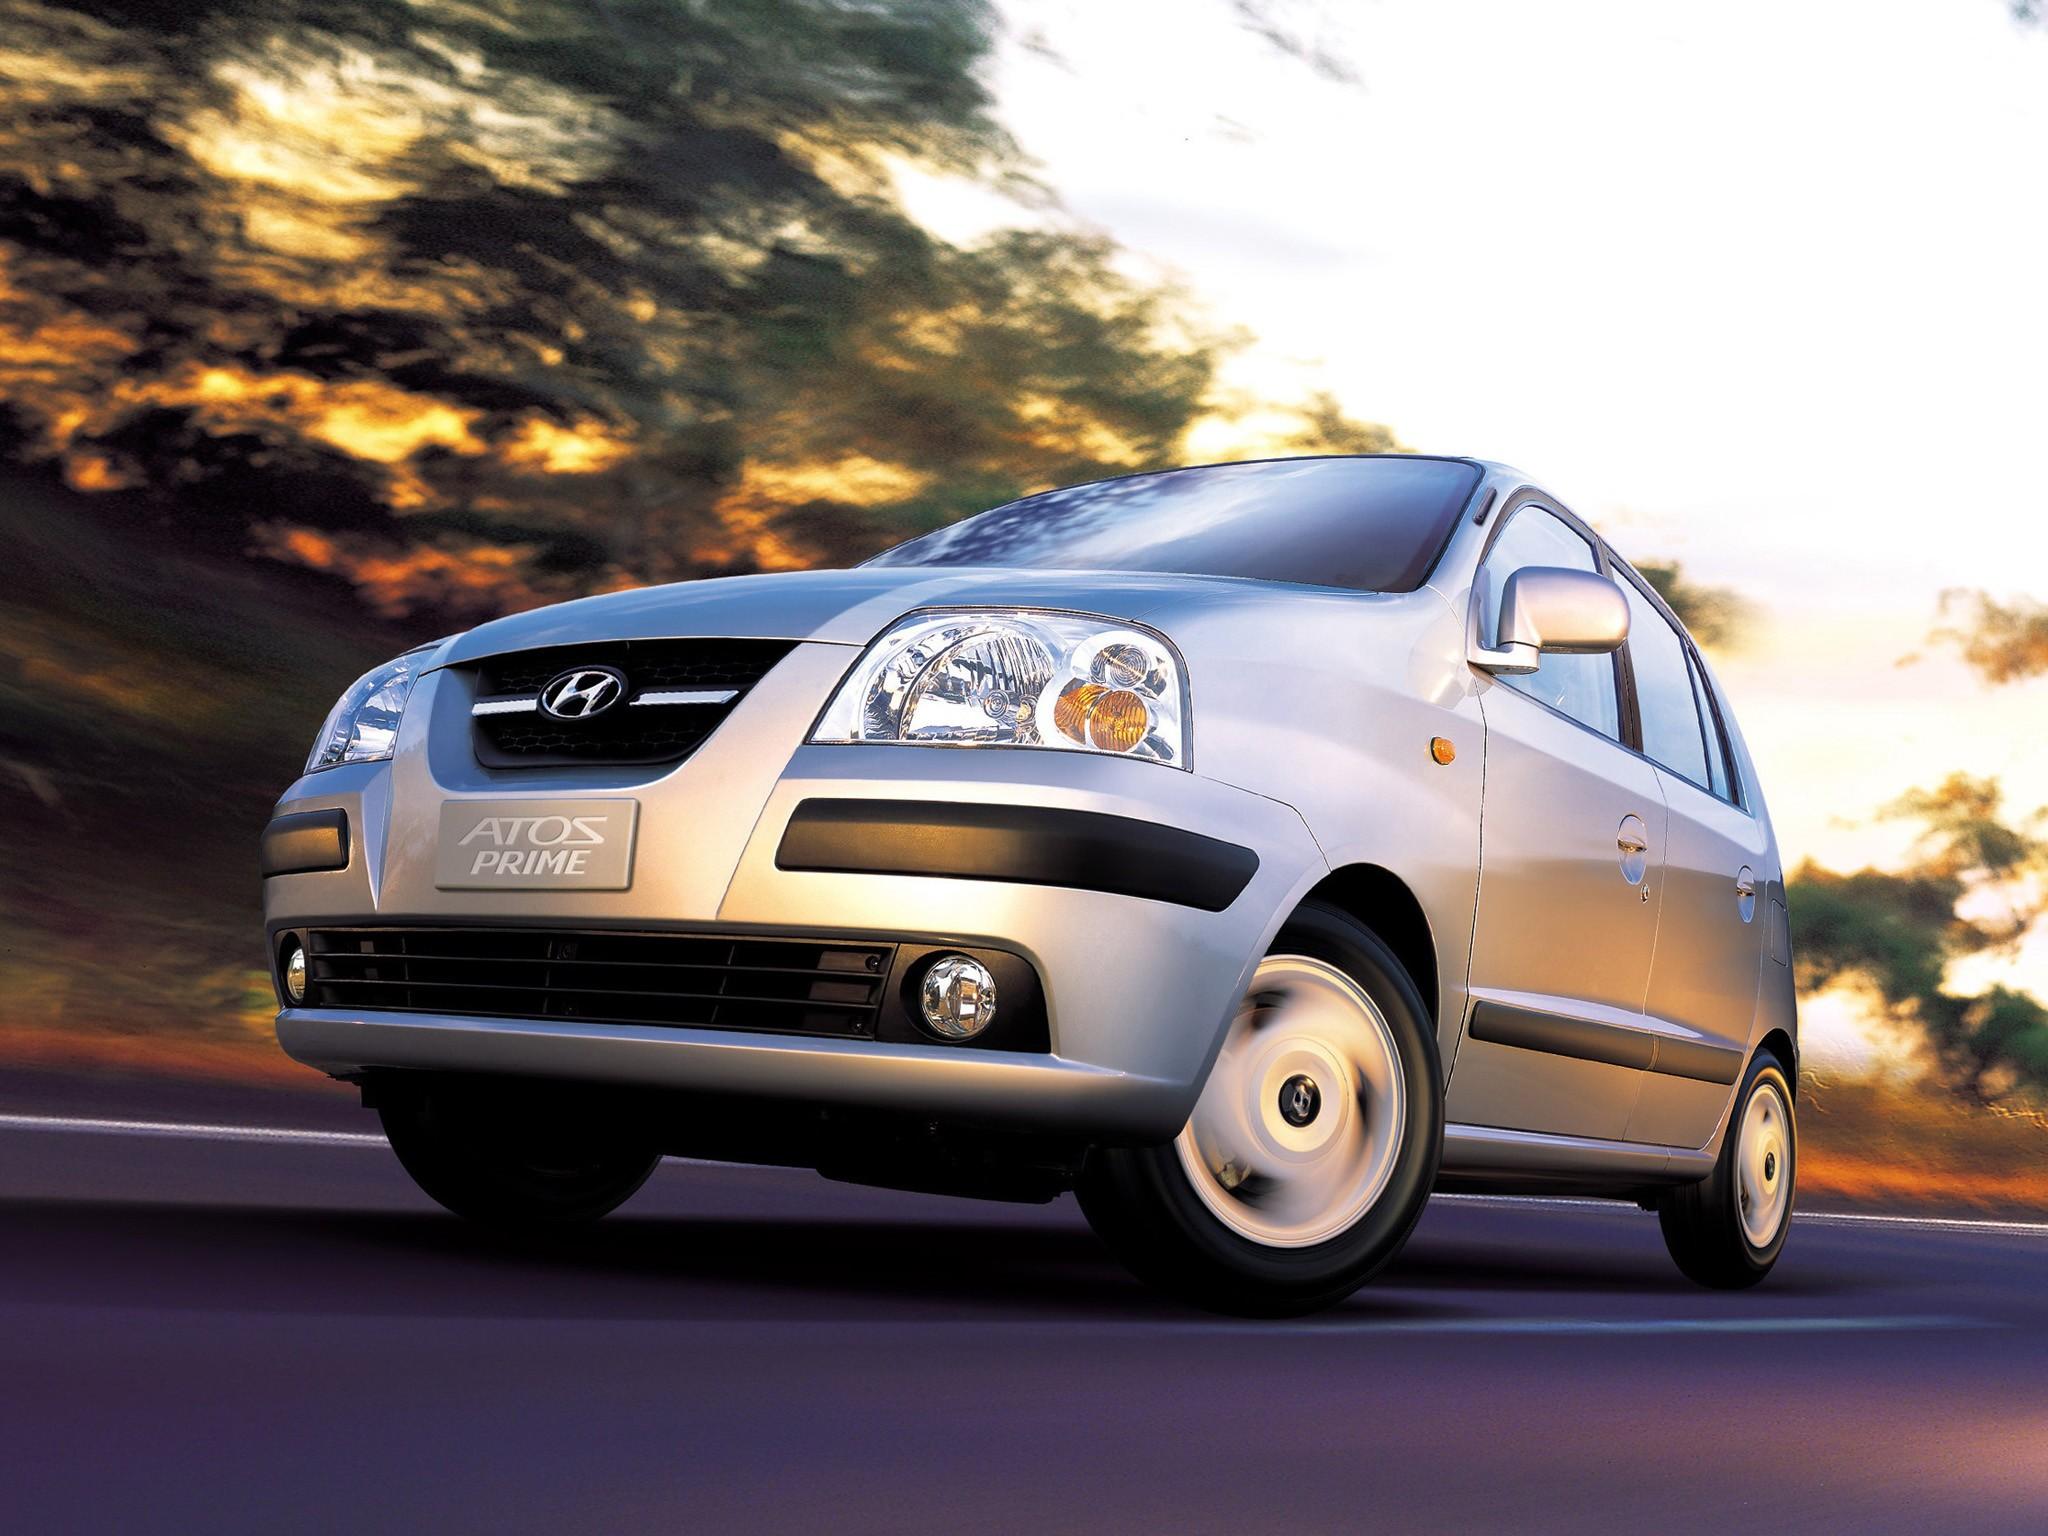 HYUNDAI Atos - 2005, 2006, 2007, 2008 - autoevolution